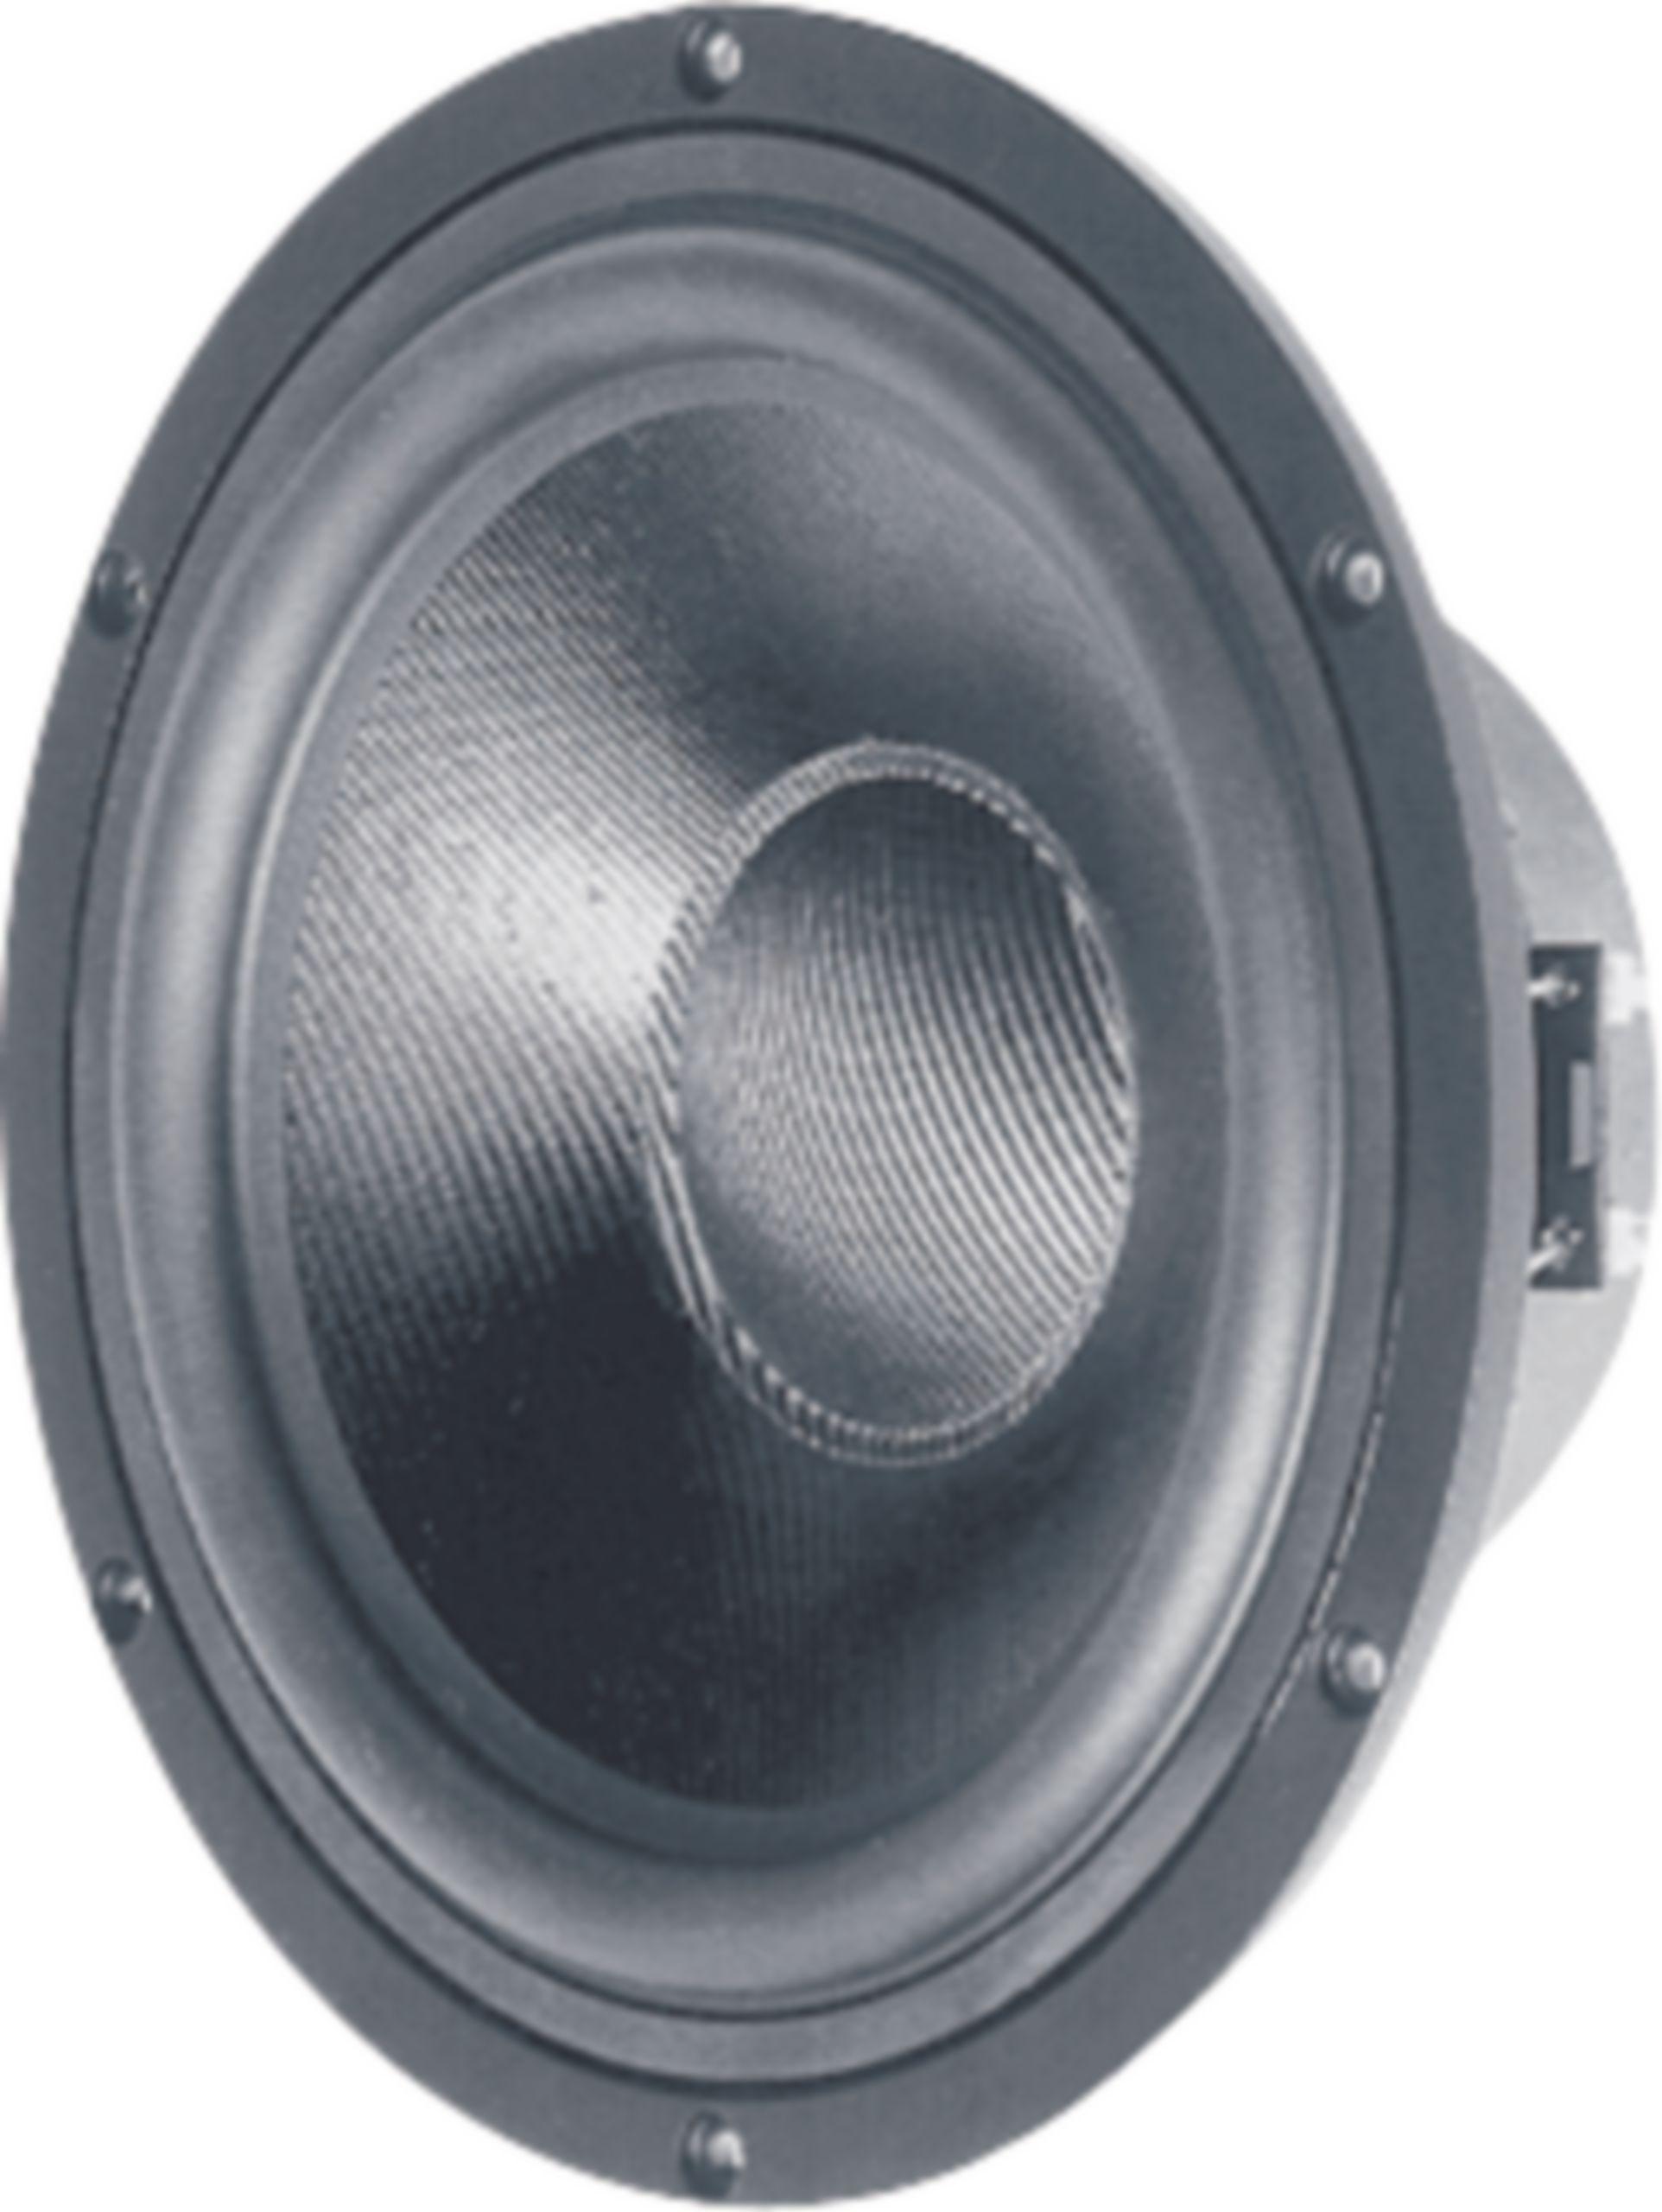 Basový reproduktor 4 Ohm 180 W Visaton, VS-GF200